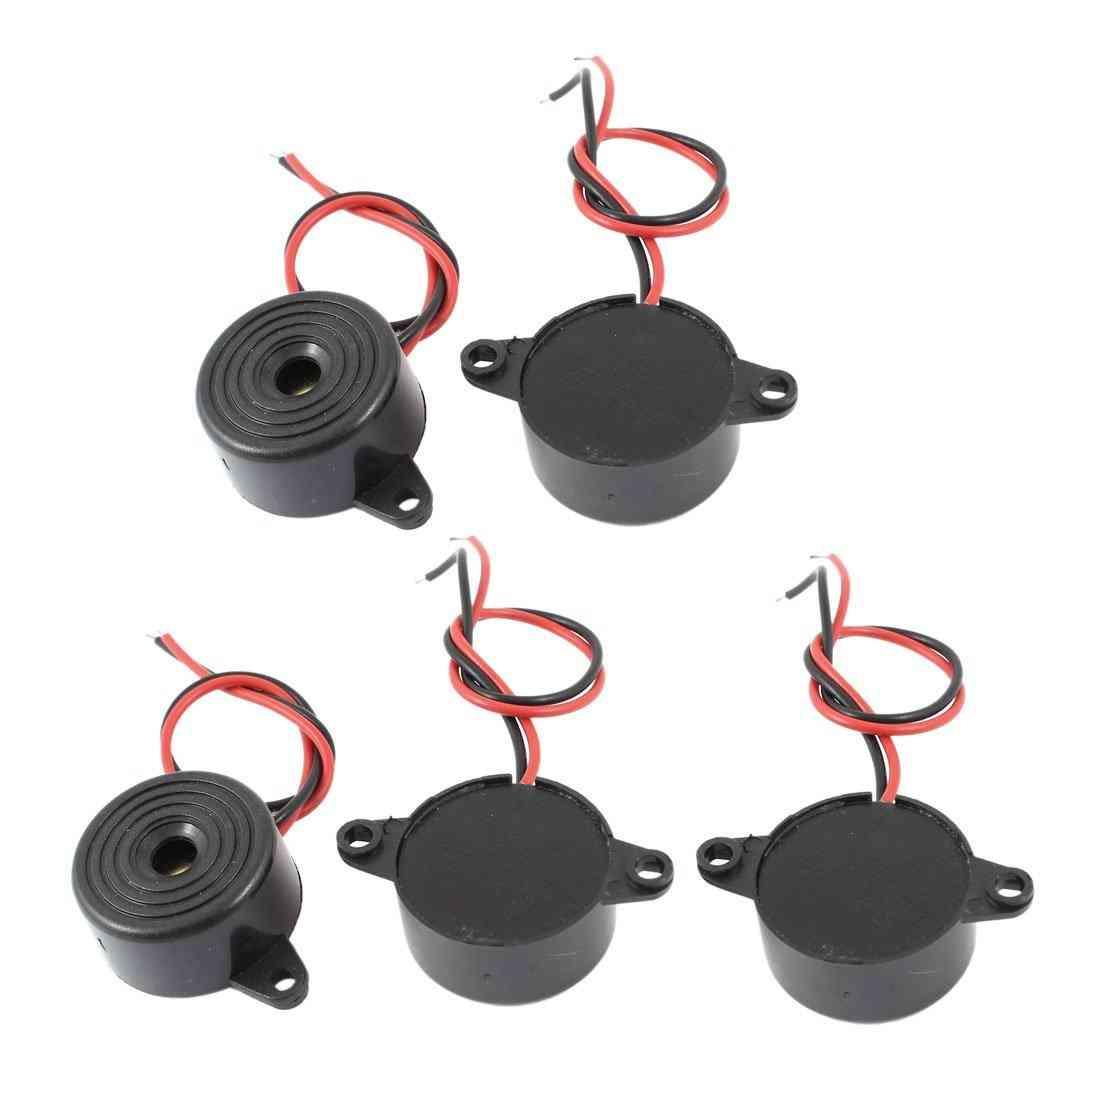 Mool Dc 3-24v 85db Sound Electronic Buzzer Alarm